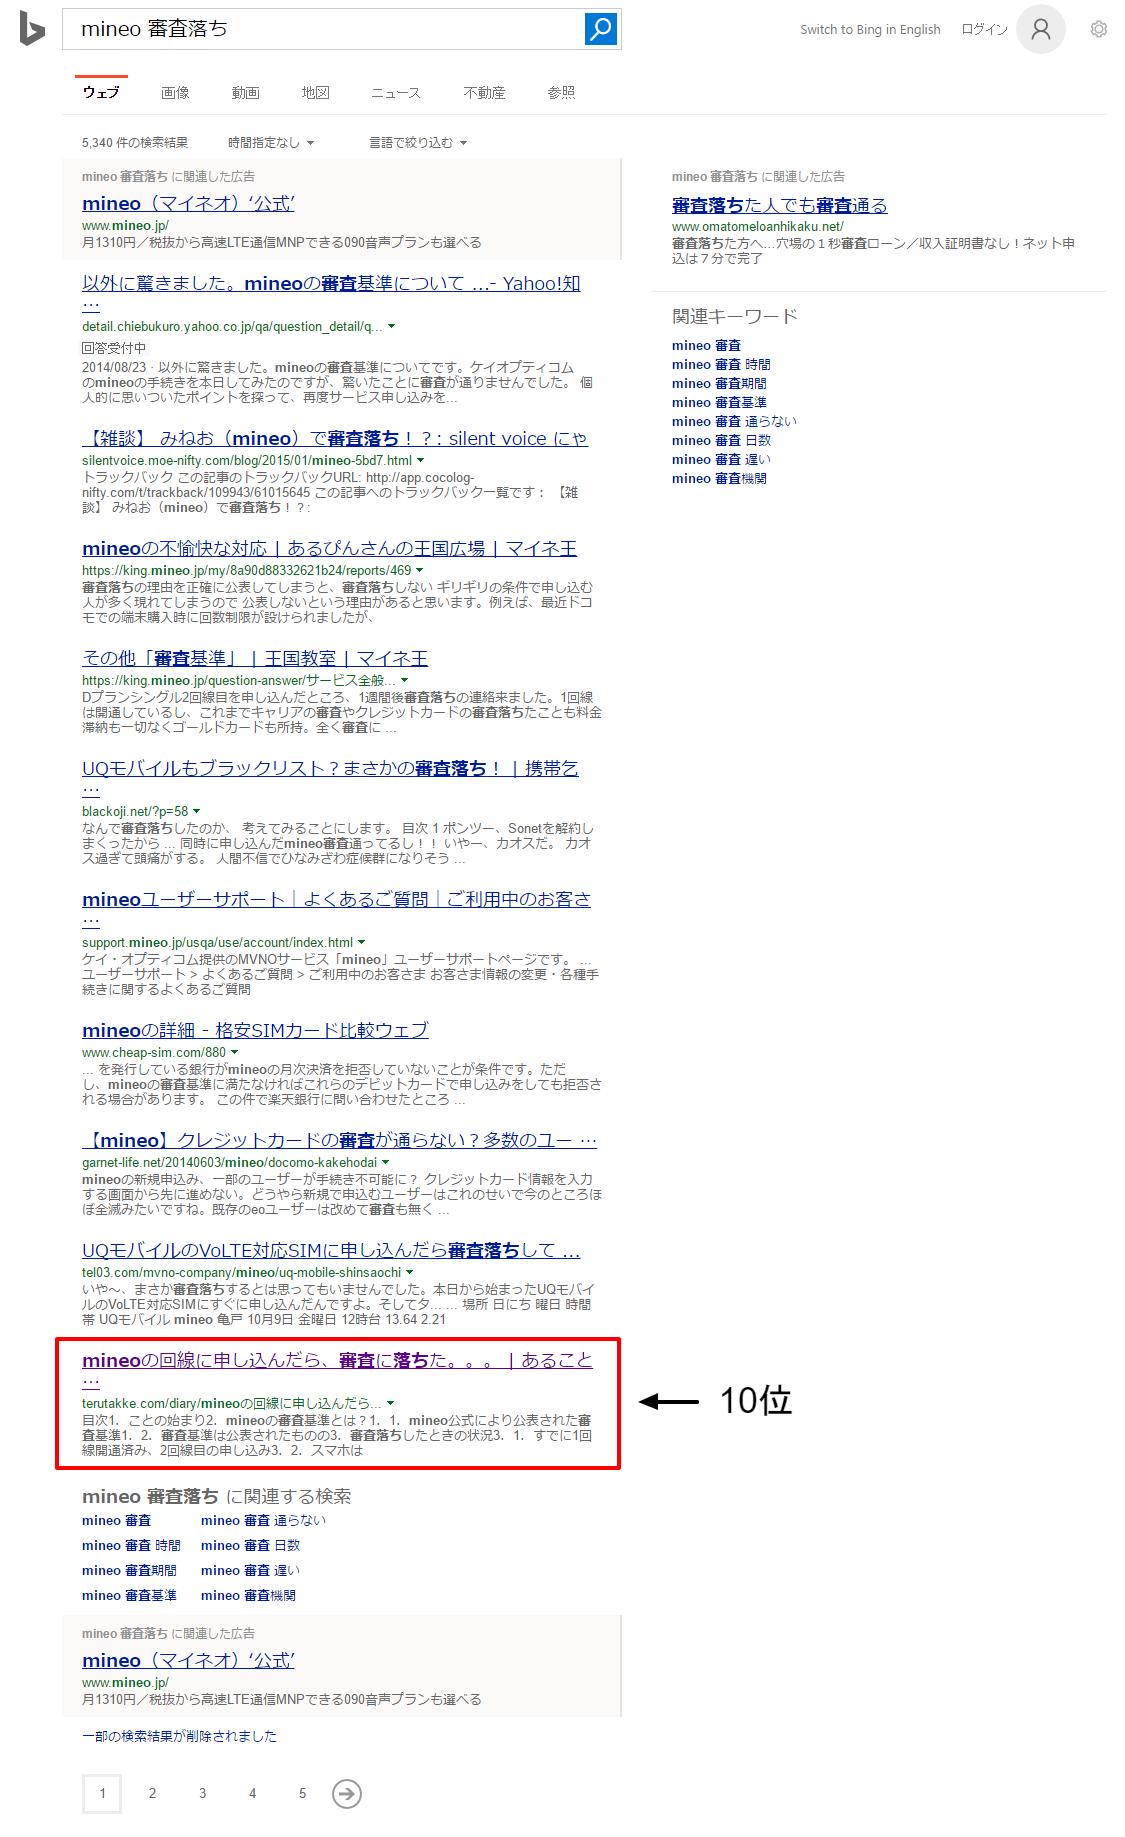 mineo 審査落ち   Bing